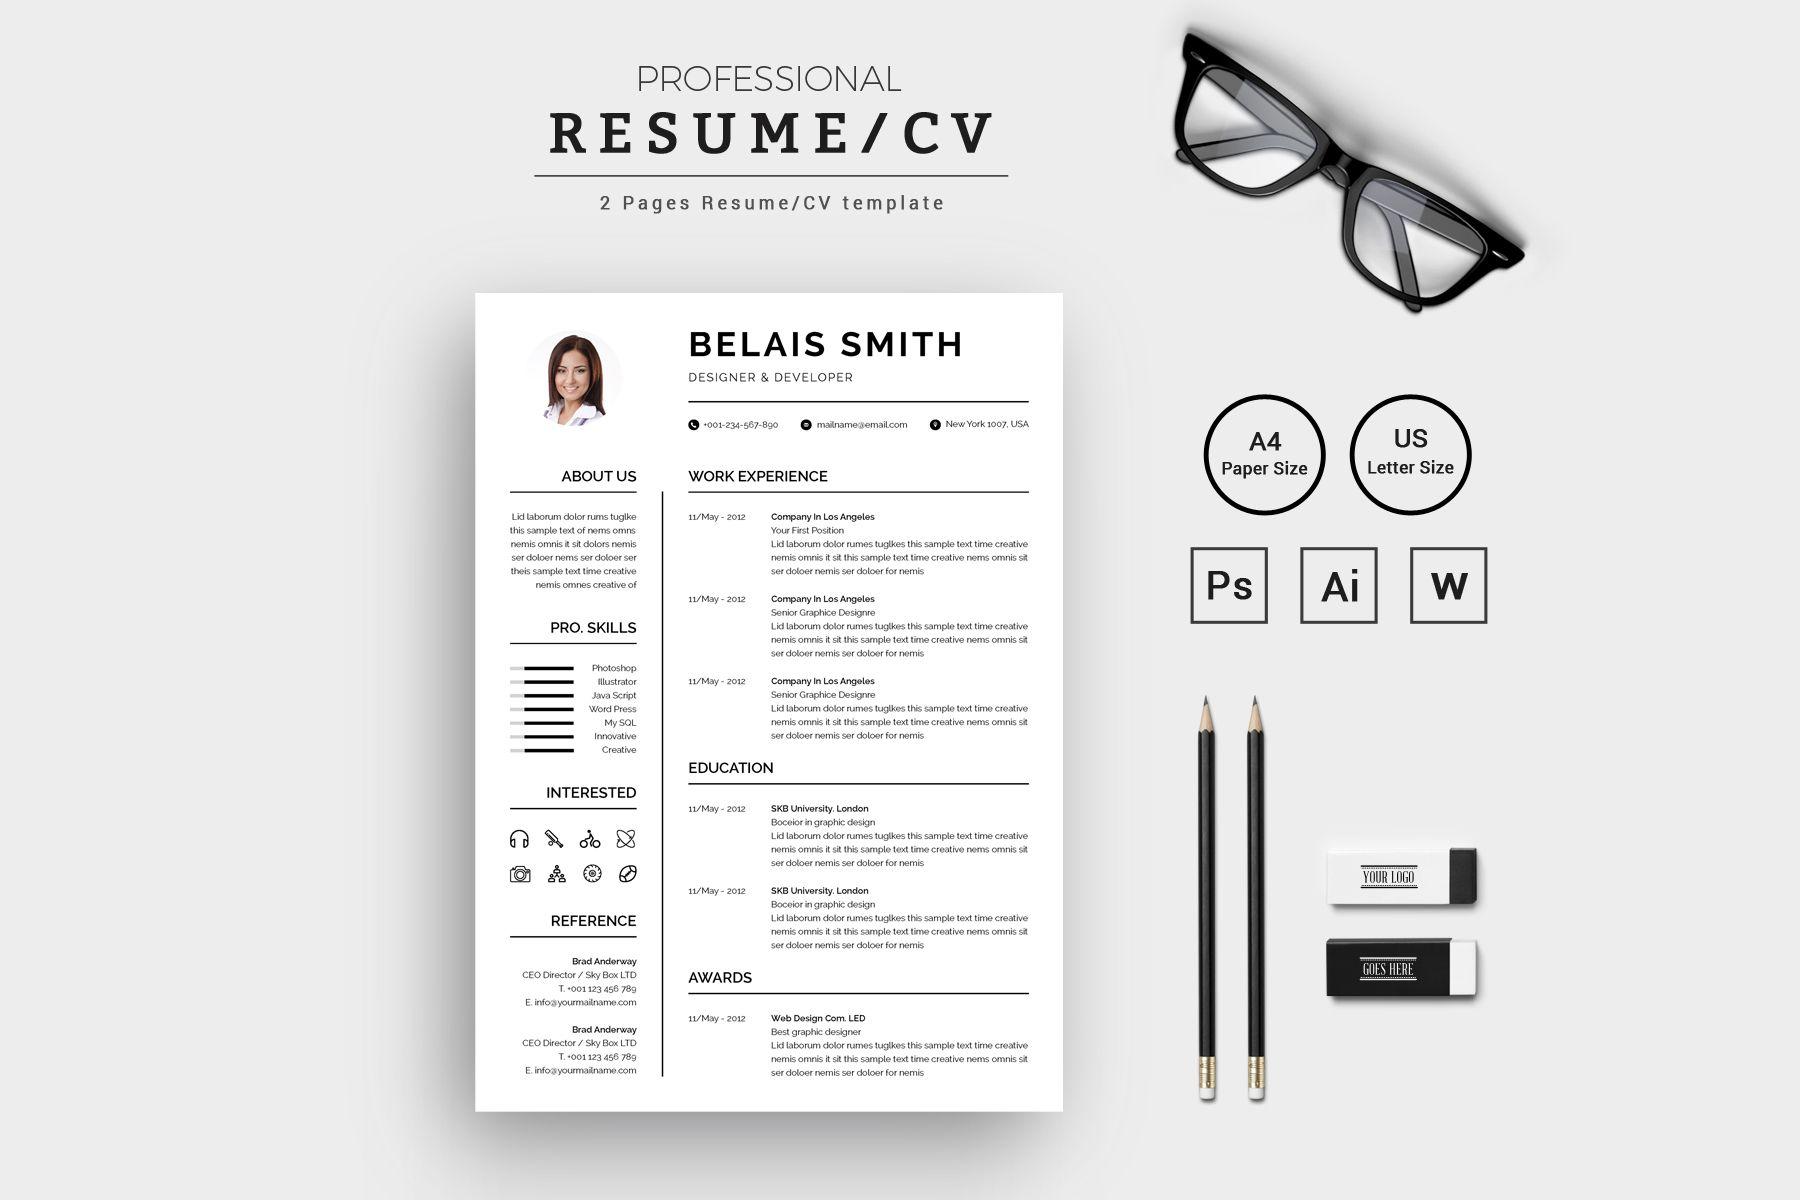 Belais smith designer developer resumecv resume